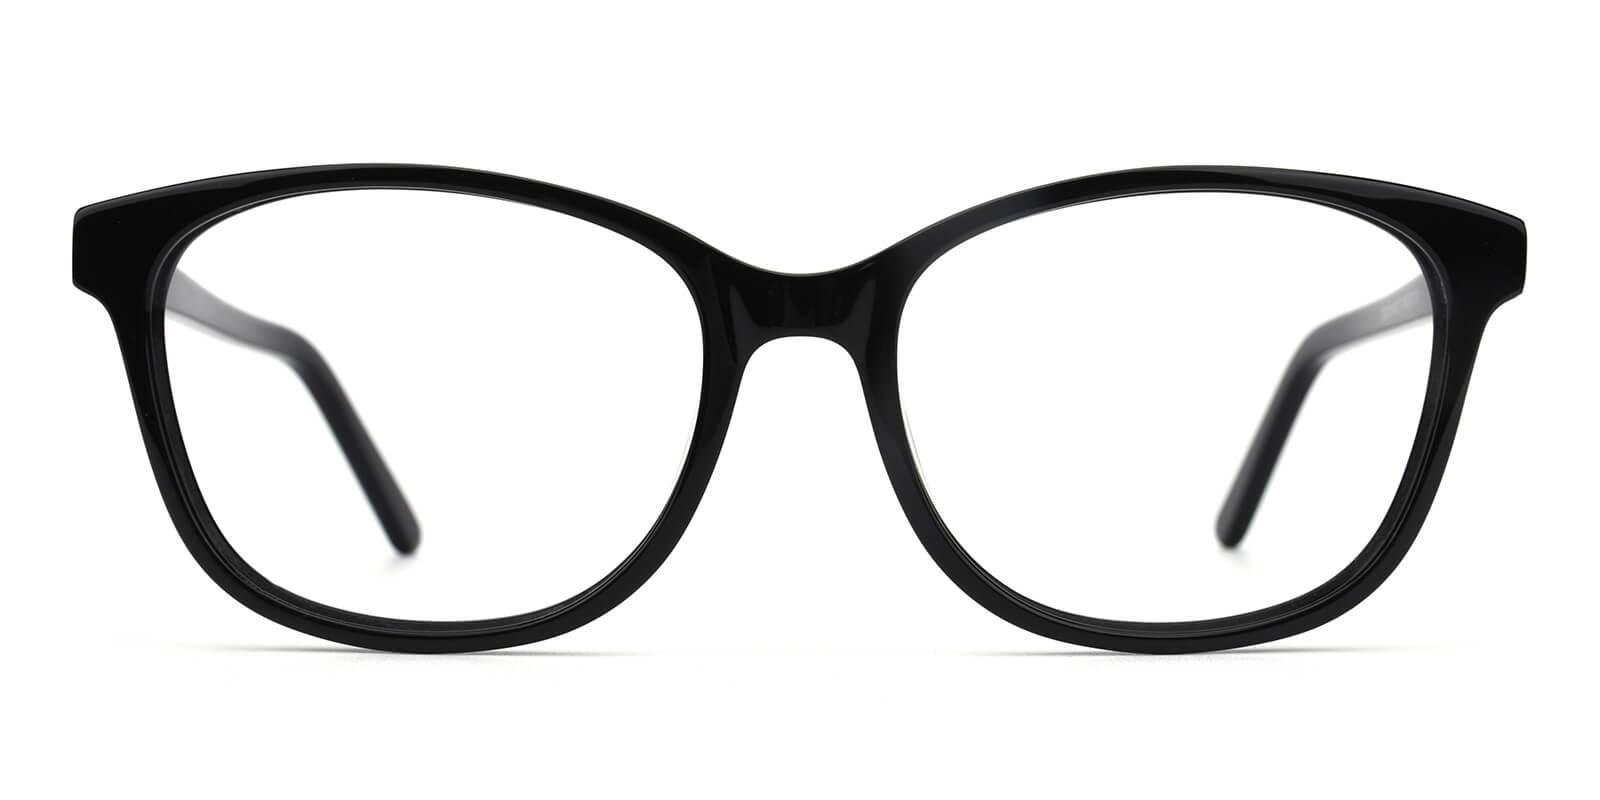 Bolivia-Black-Cat-Acetate-Eyeglasses-additional2